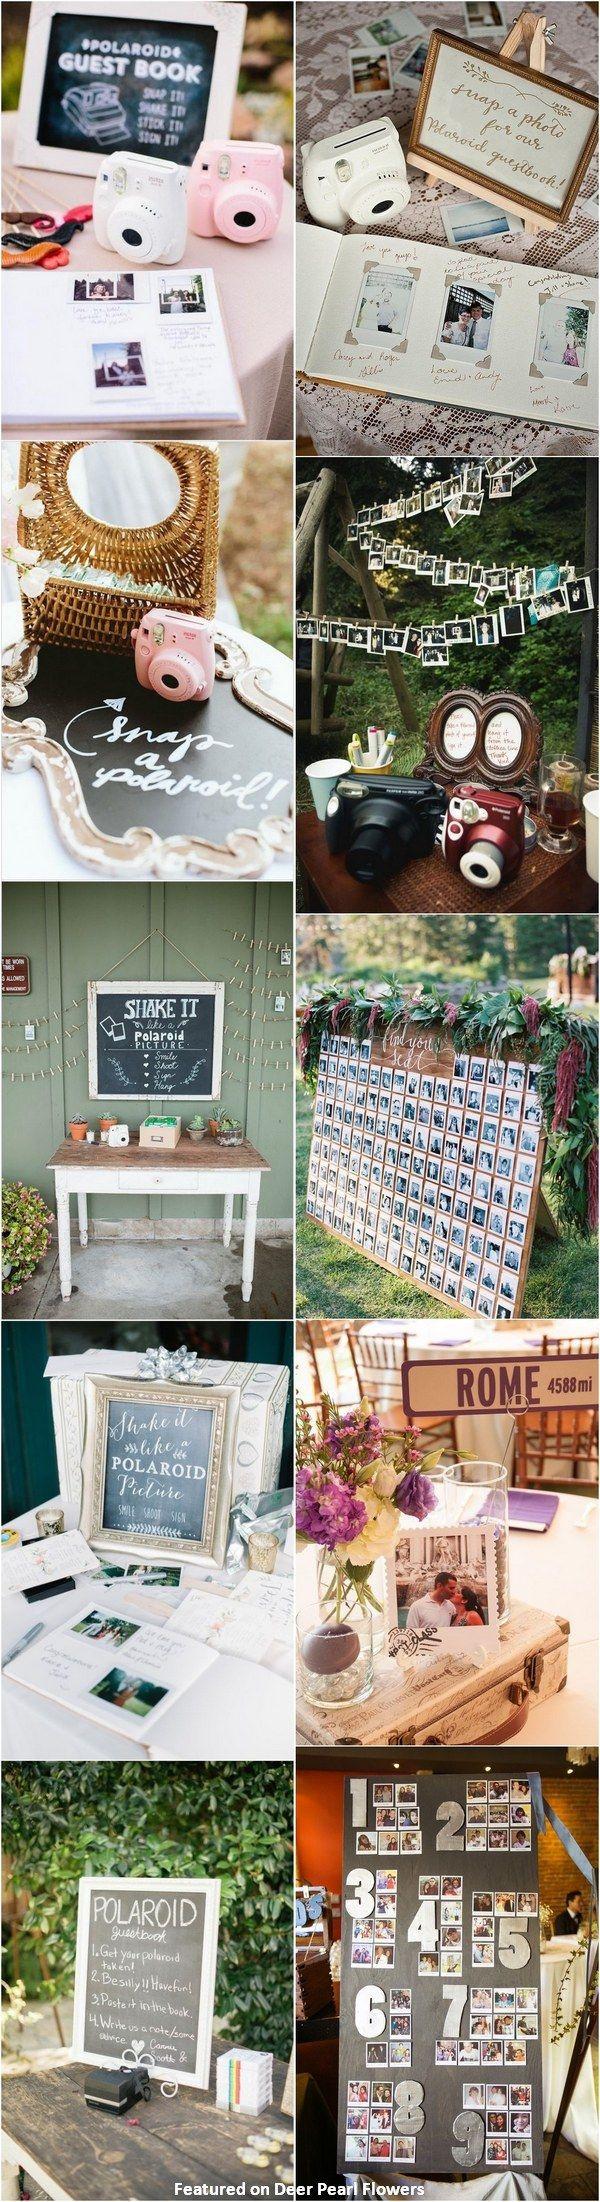 Poloroid Wedding Ideas Unique Wedding Themes Ideas 30 Creative Polaroid Wedding Ideas You